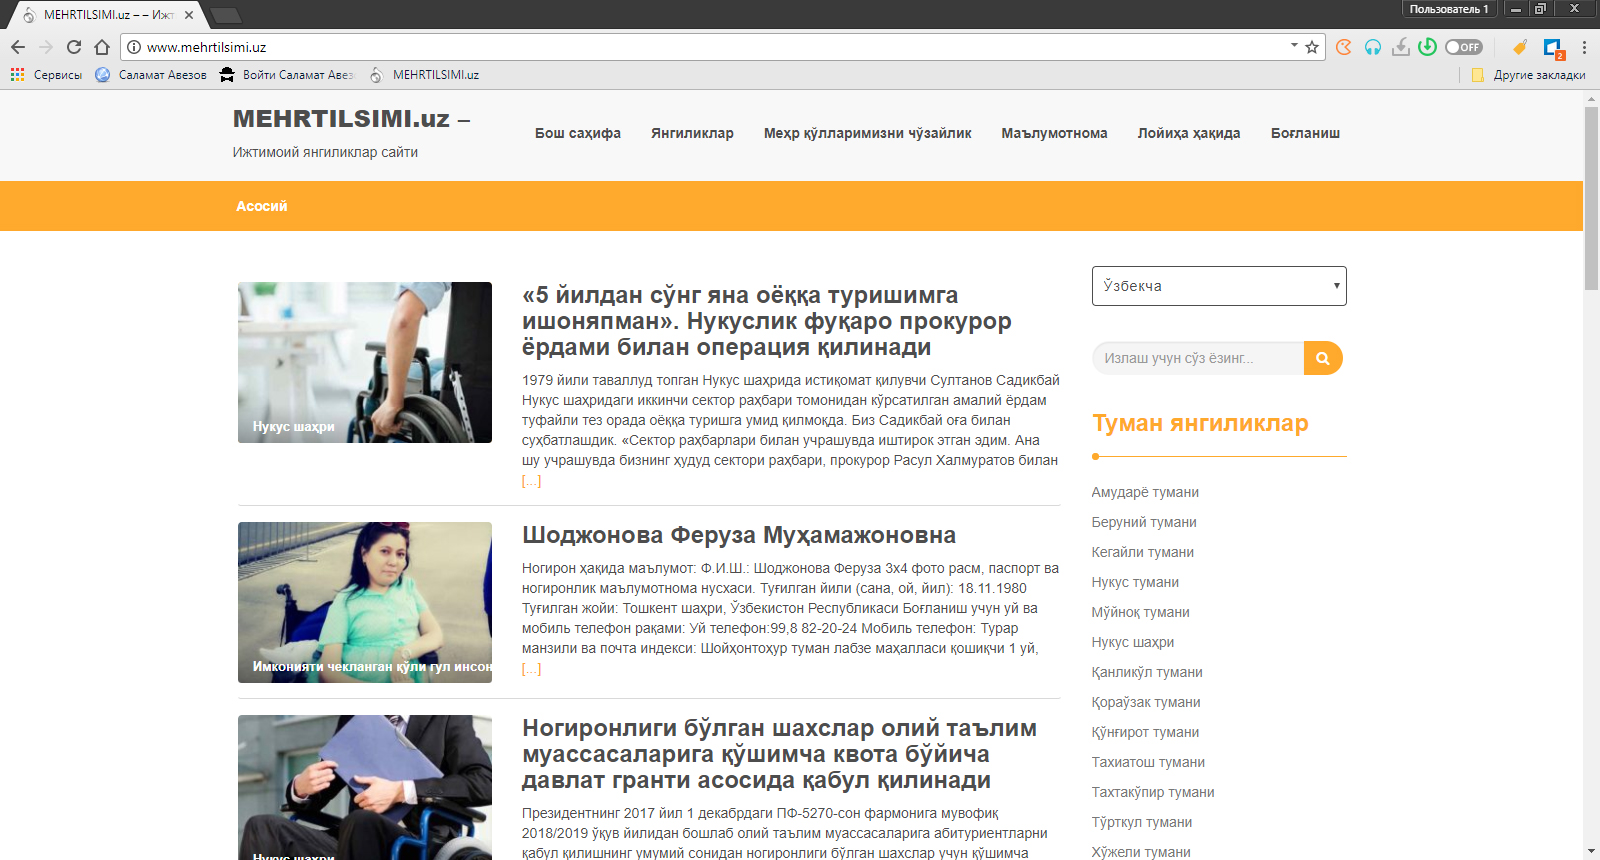 MEHRTILSIMI.uz – «Меҳр тилсими» – Ижтимоий янгиликлар сайти.